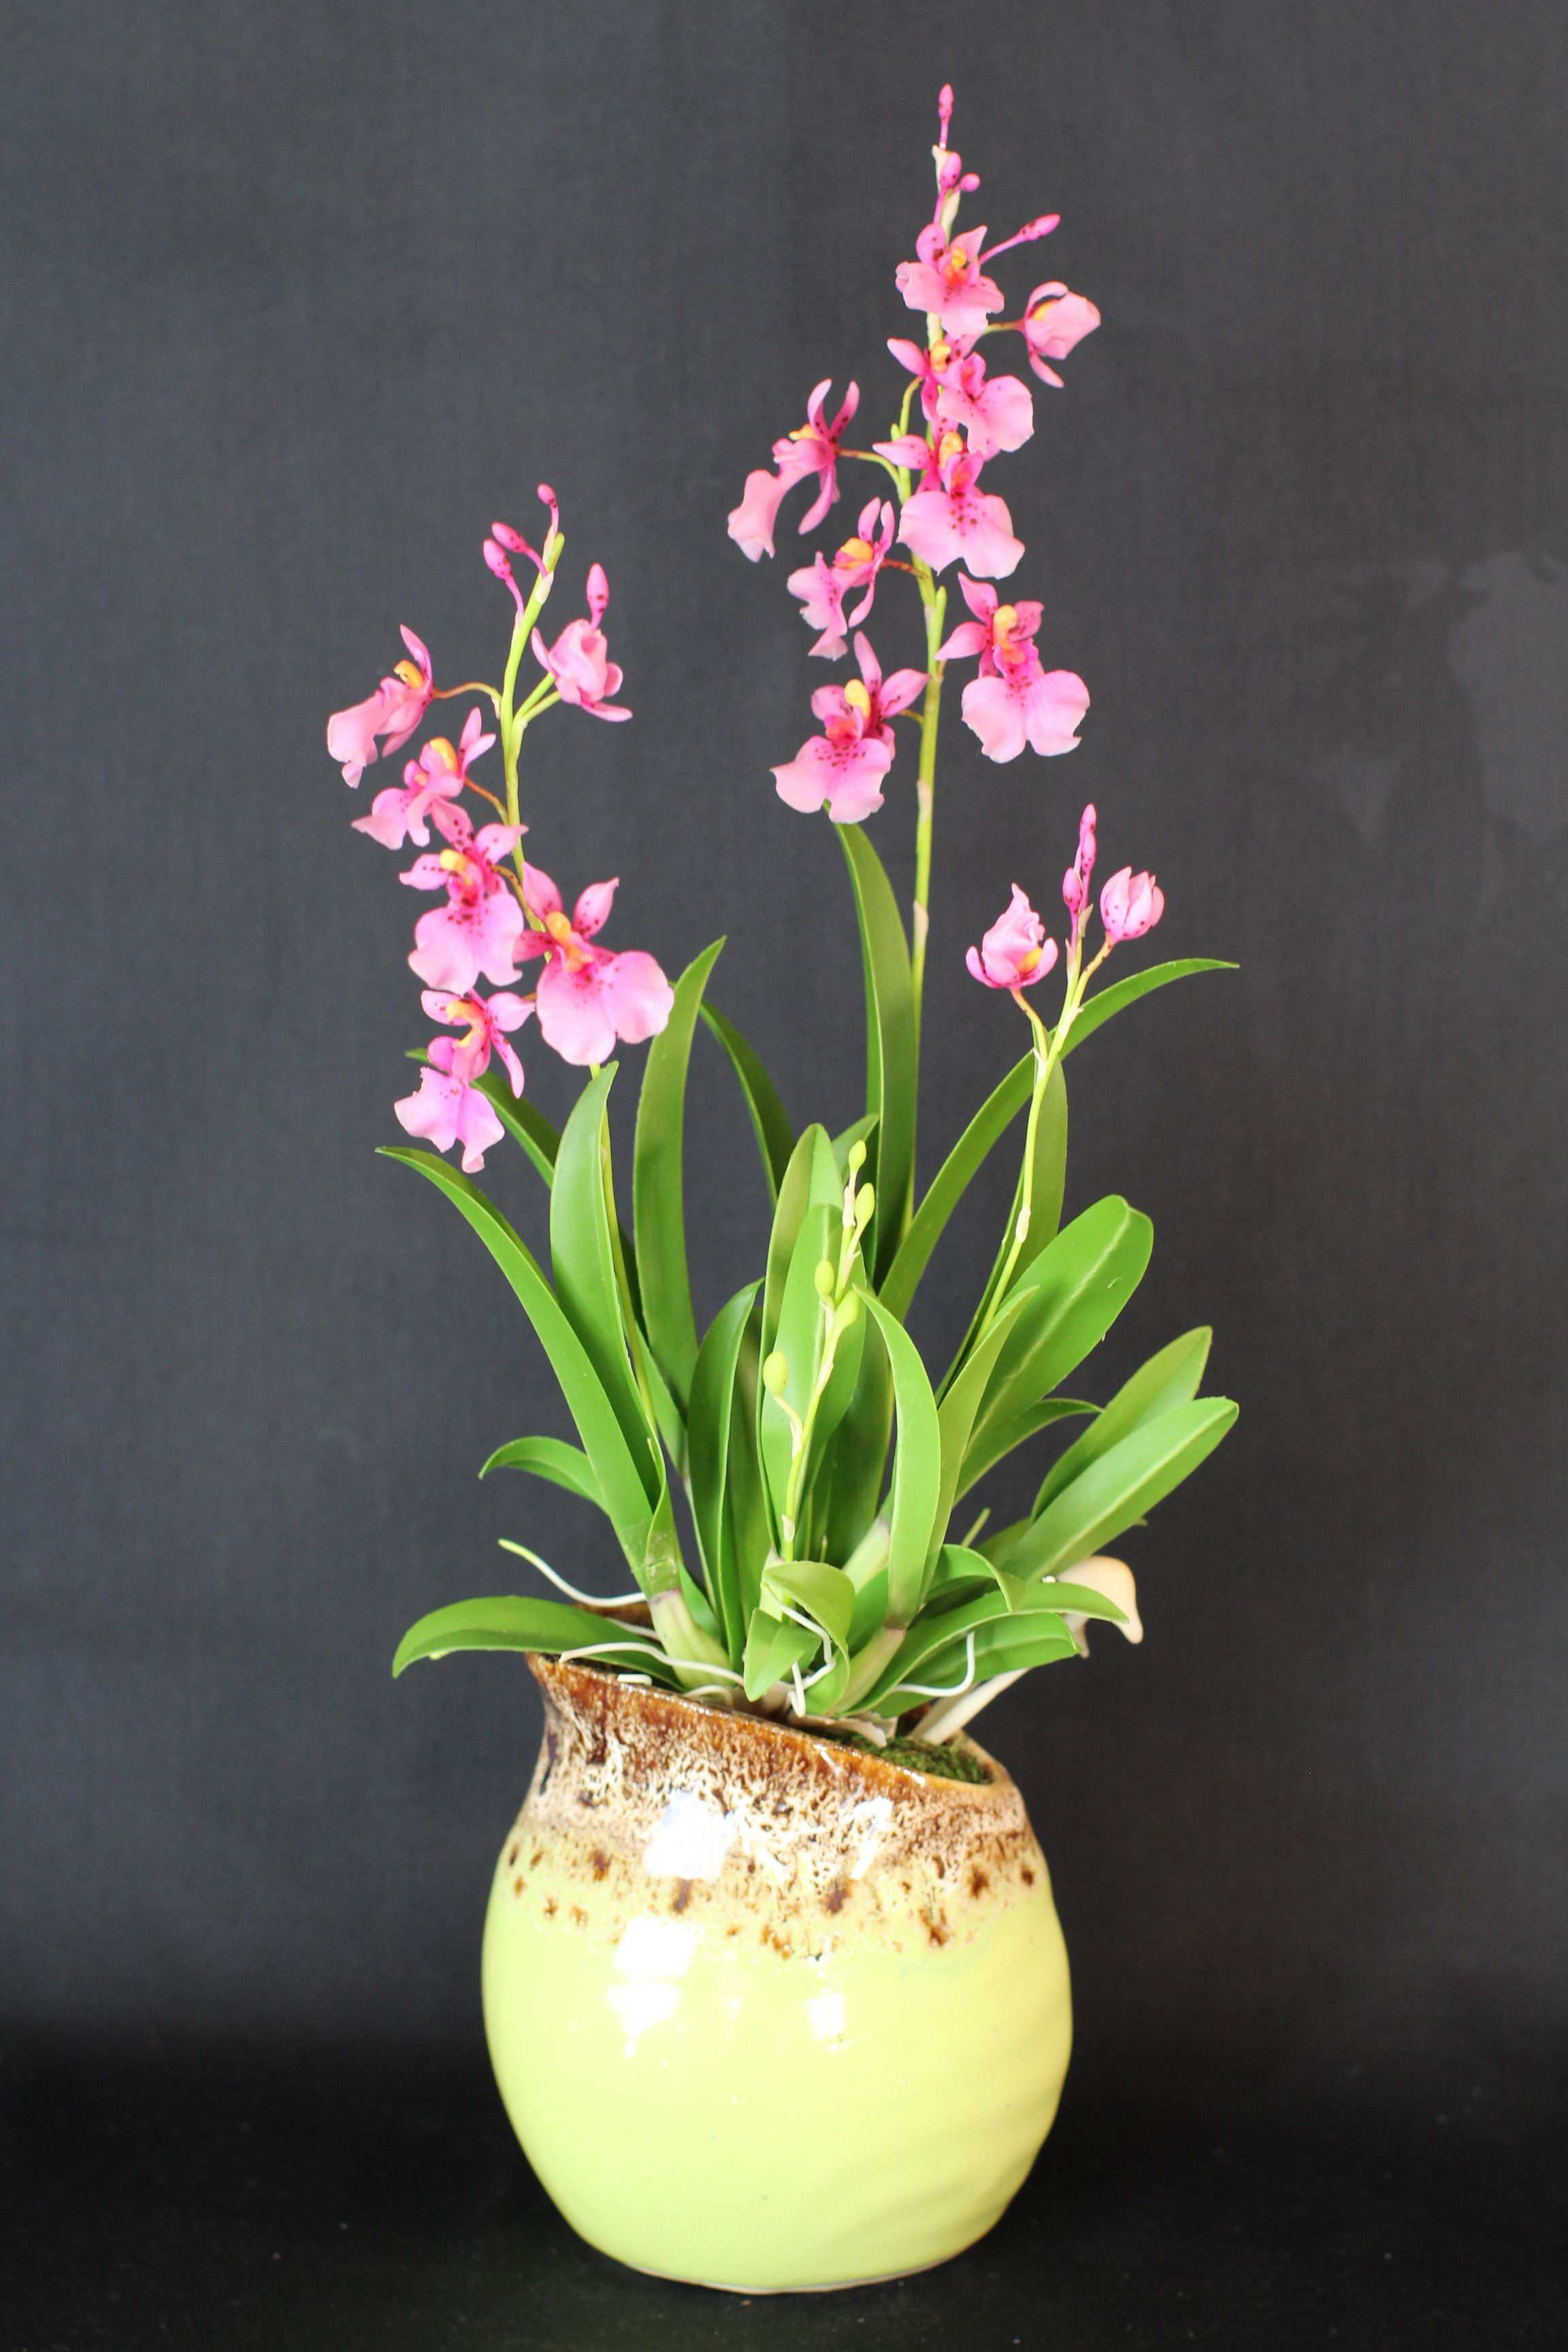 Oncidium in 2020 Oncidium, Orchids, Art and craft shows